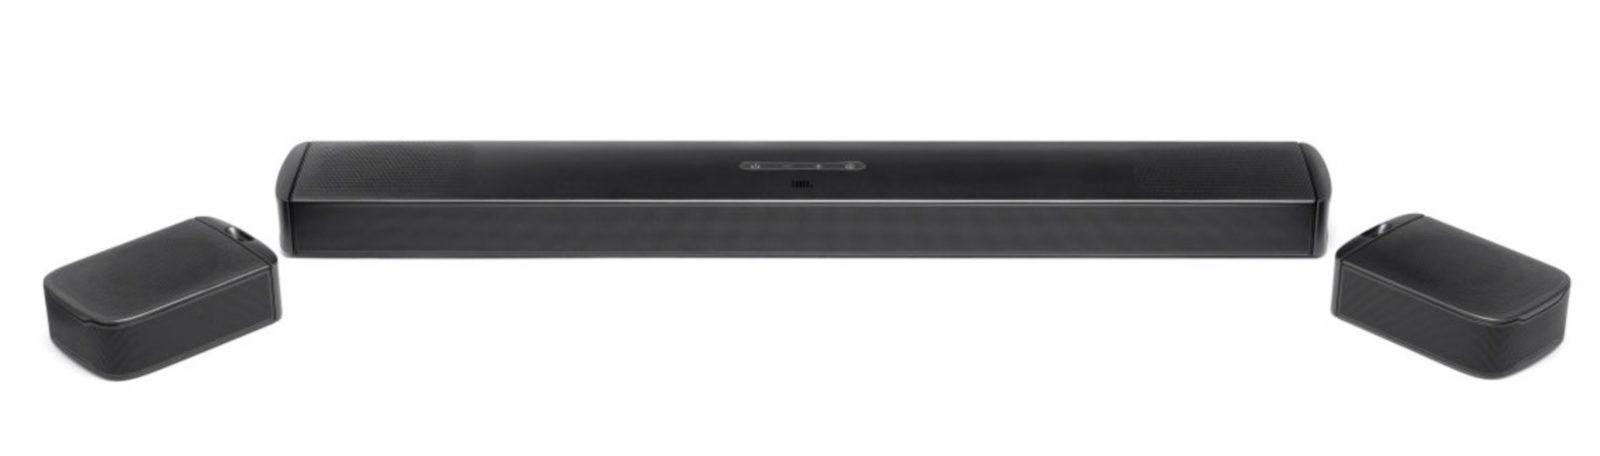 La prima soundbar Dolby Atmos JBL 9.1 è compatibile anche Airplay 2 e Chromecast